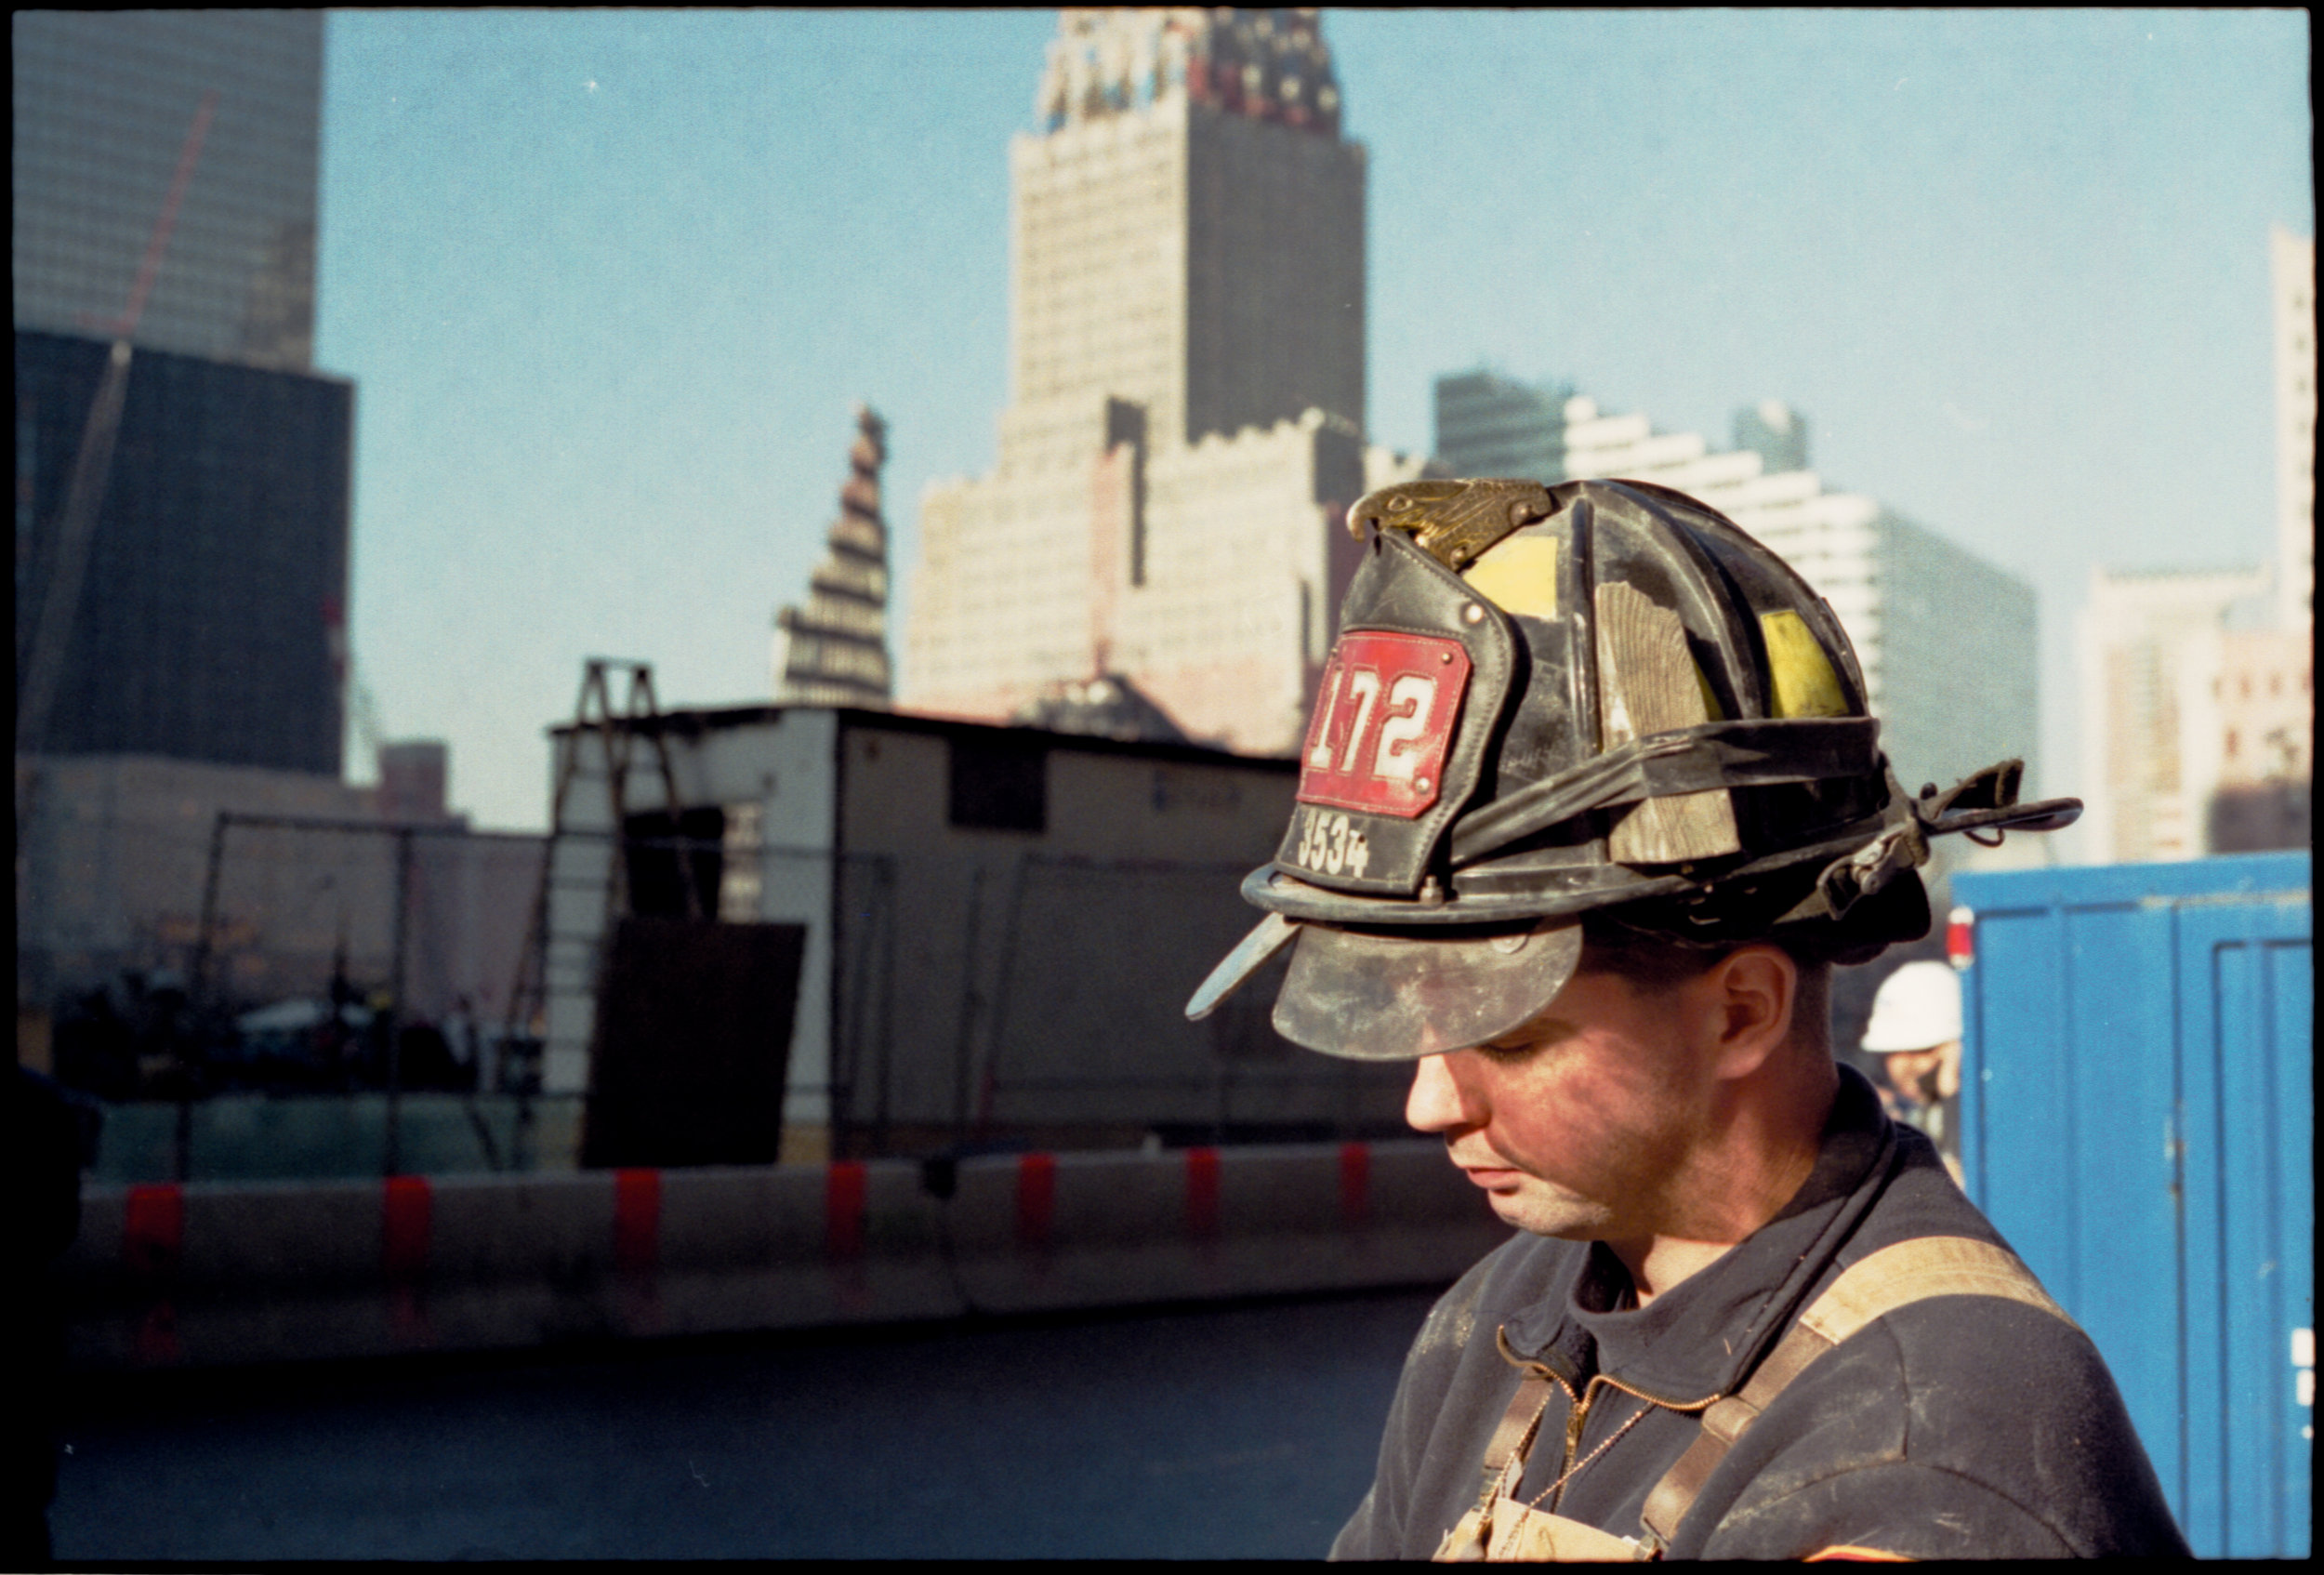 2001_WTC_R077_36_large.jpg